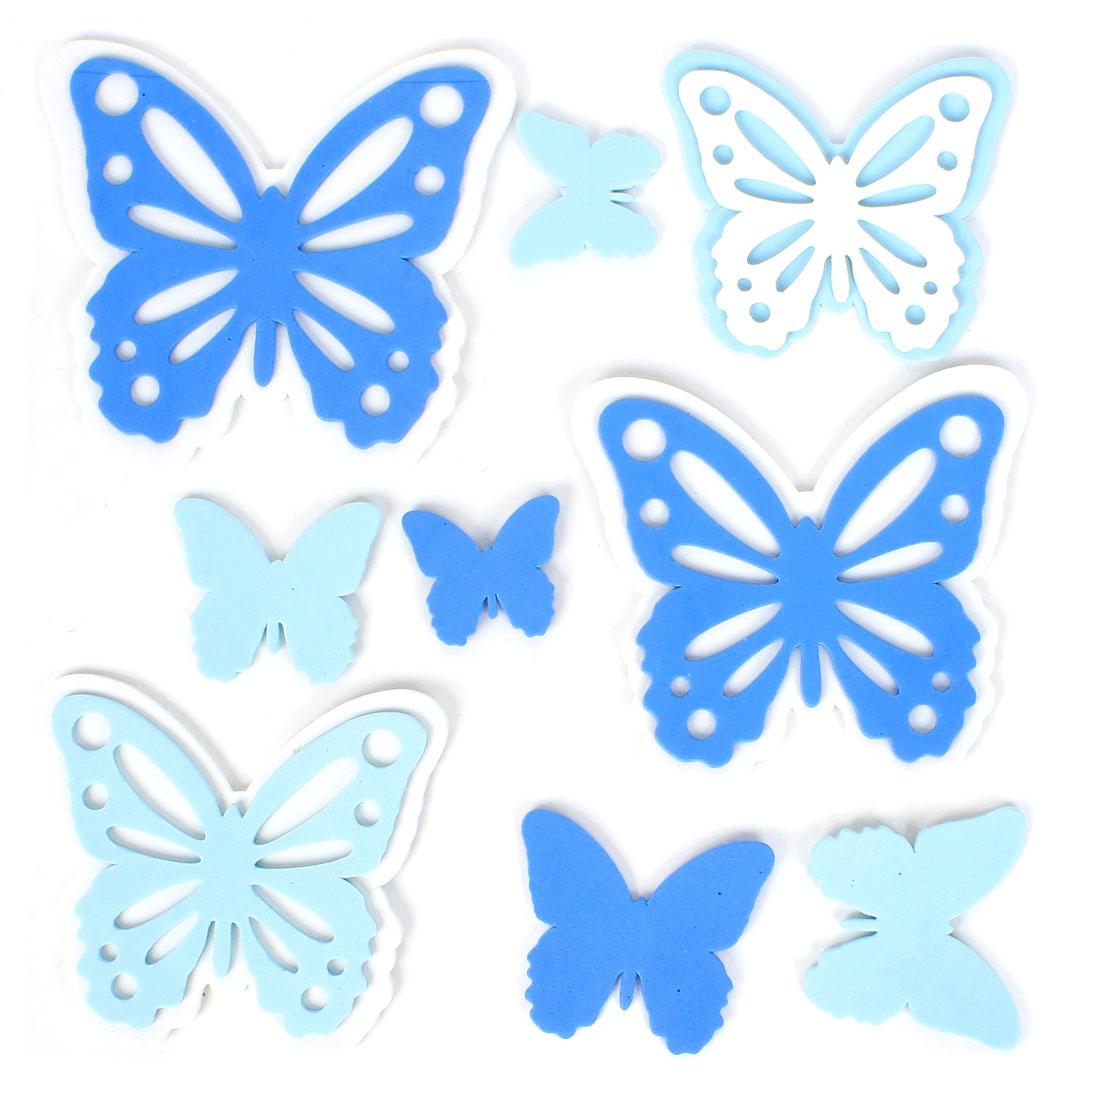 Home Bathroom Decor Butterfly 3D Foam Wall Sticker Set DIY Blue White